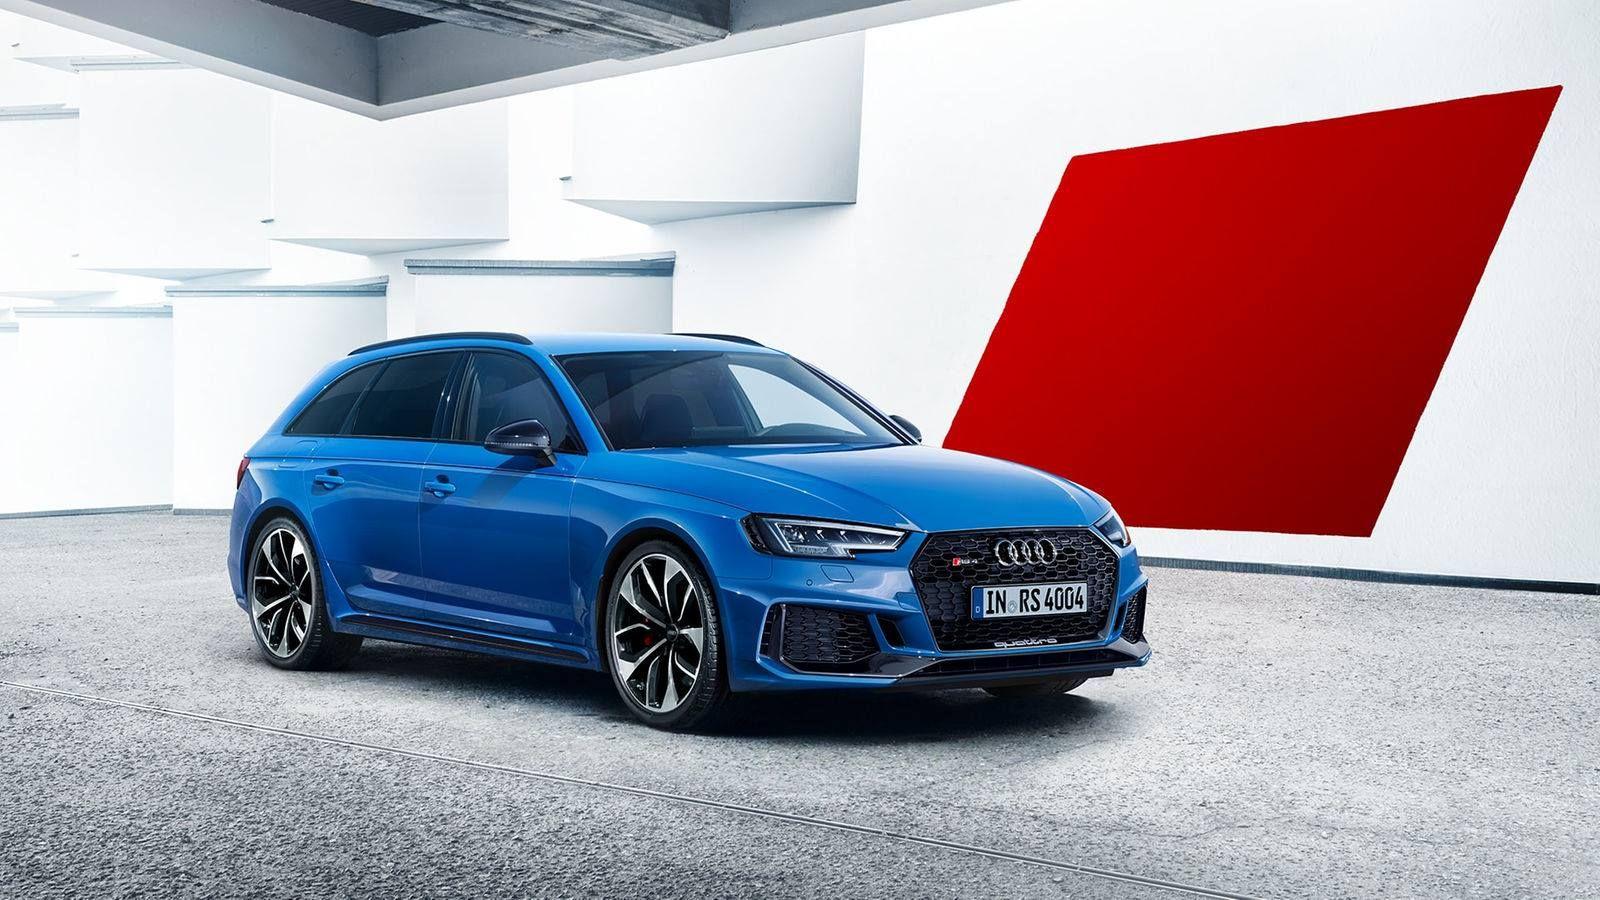 2018 Audi Rs4 Avant รถยนต Audi Rs4 Audi Cars Audi